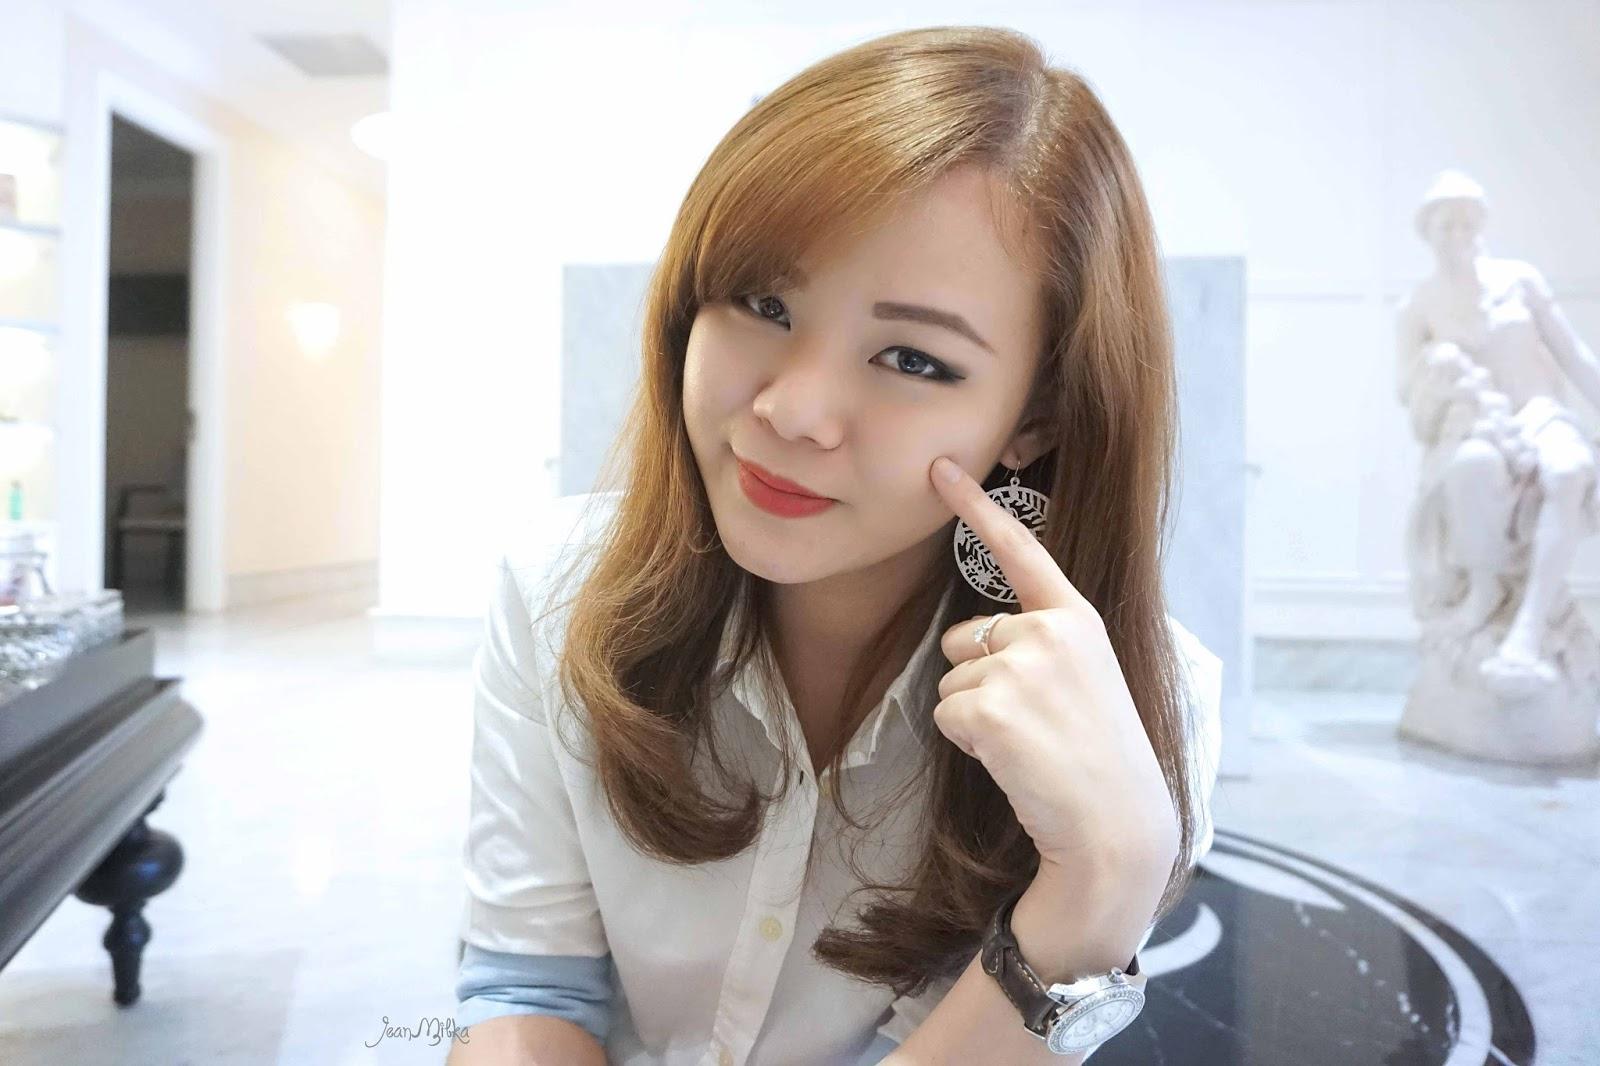 oya clinic, beauty clinic, face contour, beauty surgery, face, klinik kecantikan, indonesia, jakarta, cewek